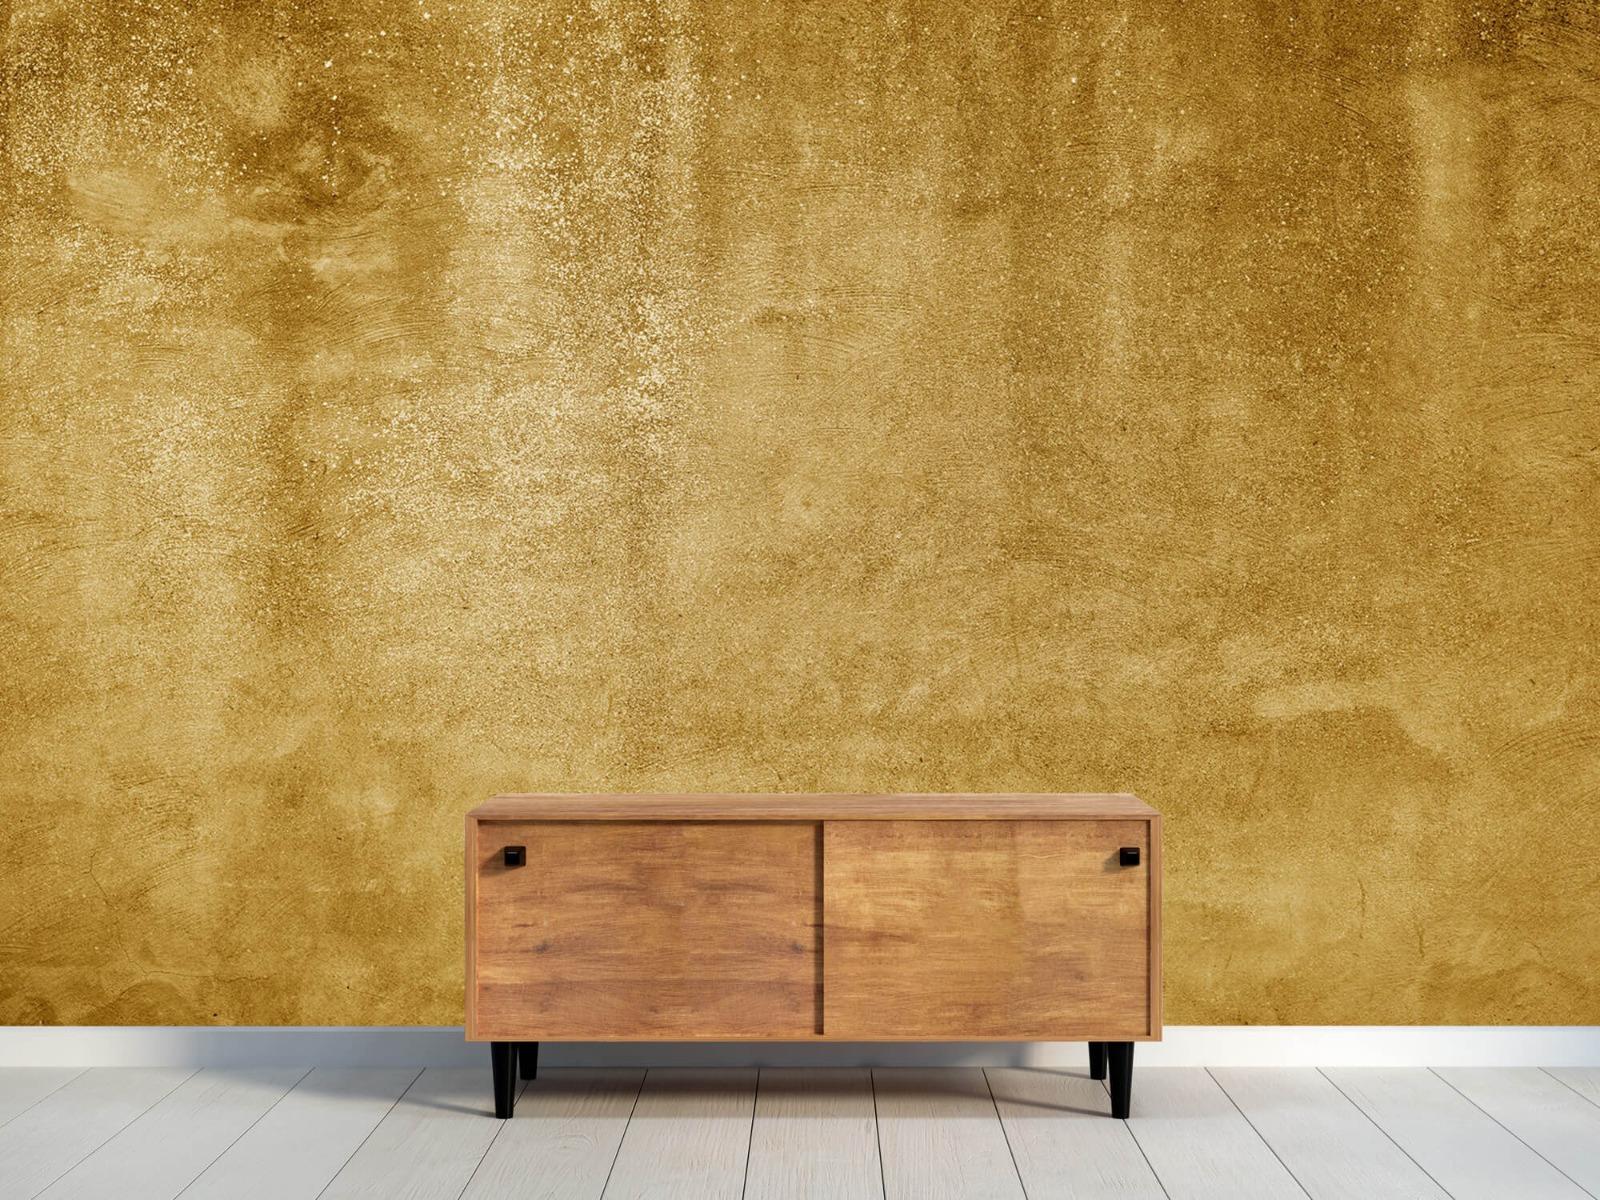 Betonlook behang - Oker geel beton - Woonkamer 10